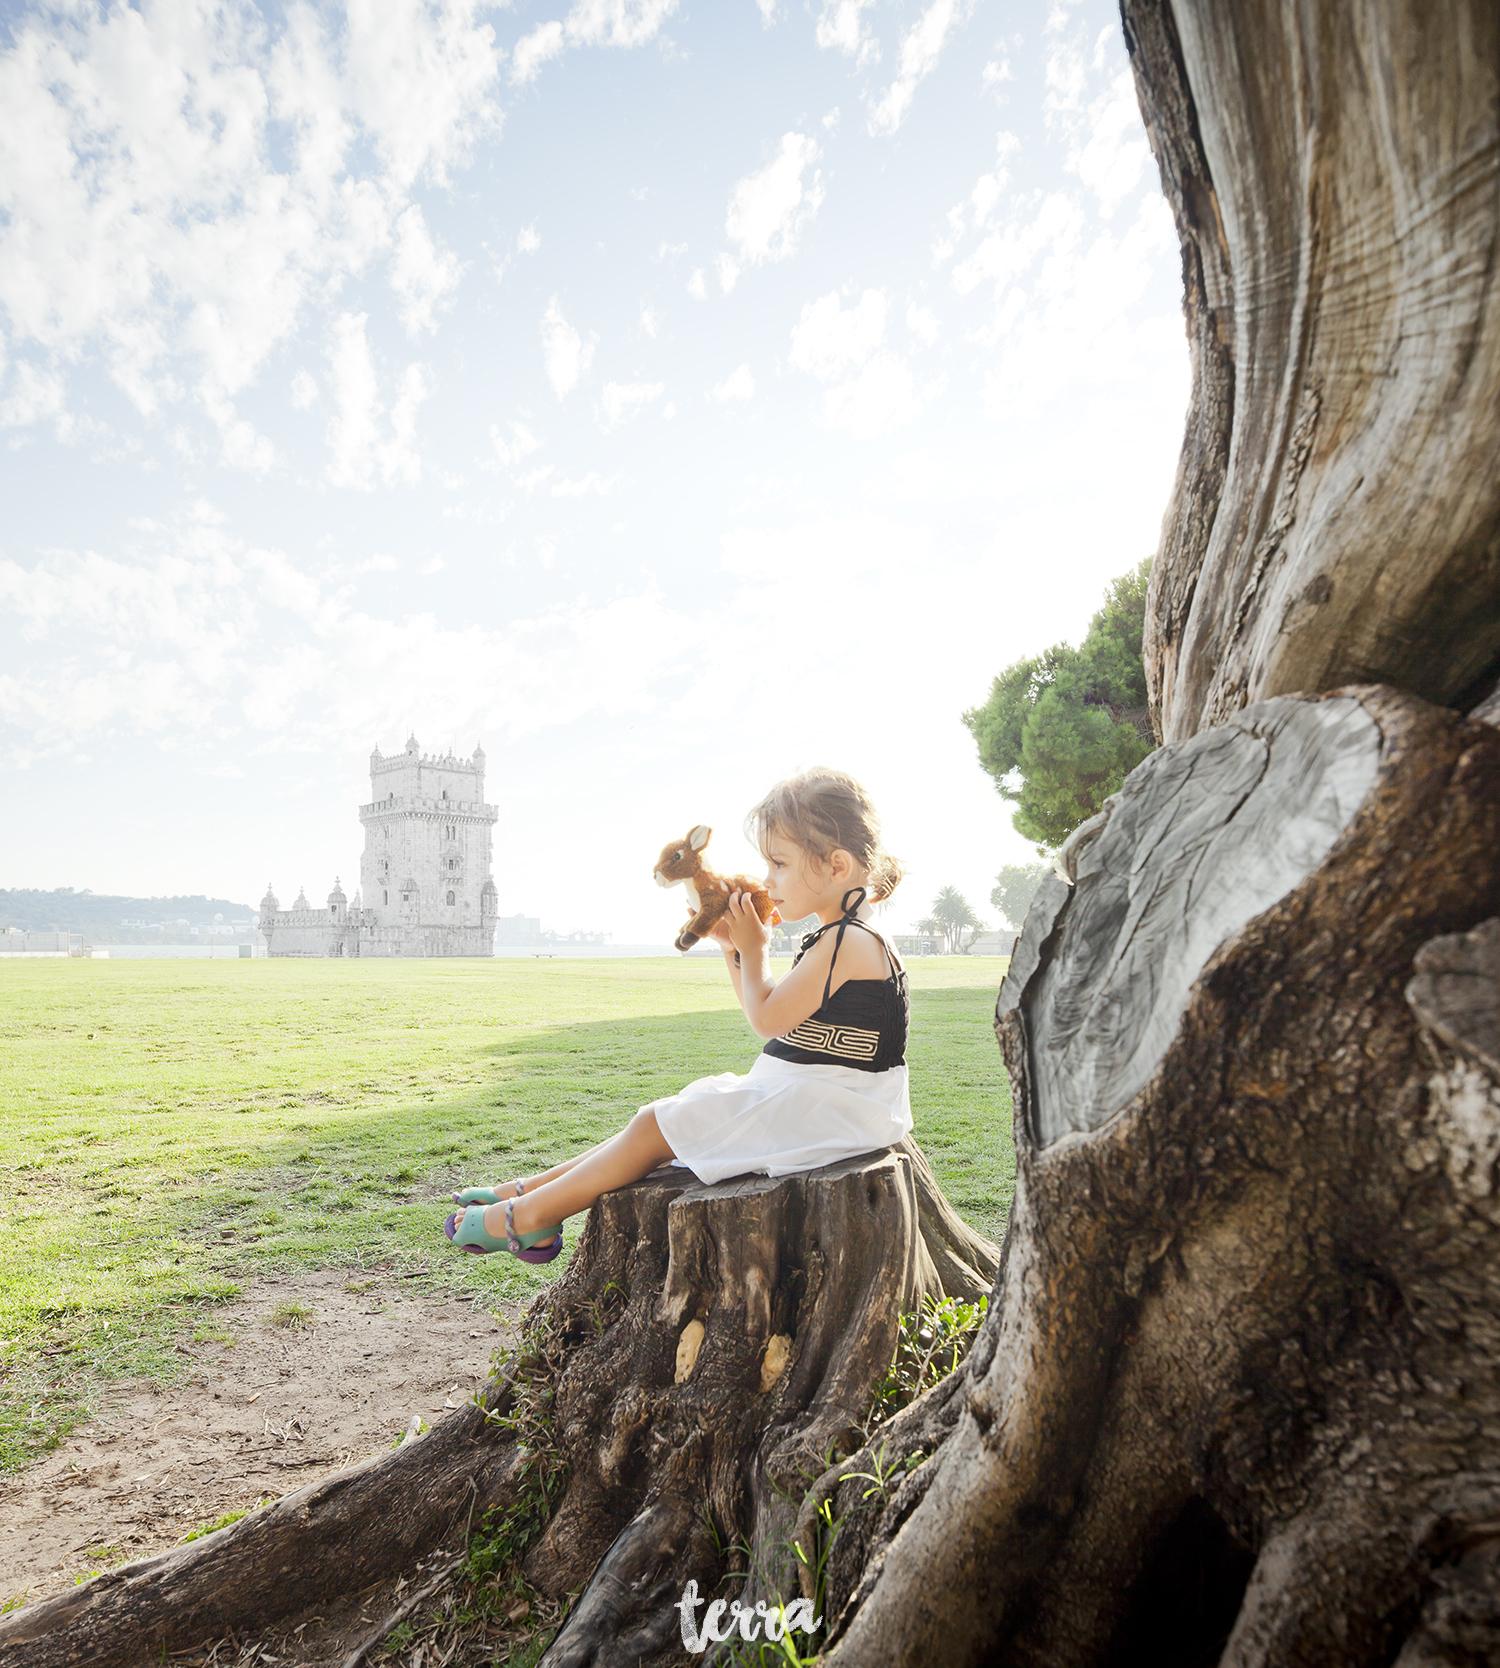 sessao-fotografica-familia-torre-belem-terra-fotografia-0007.jpg